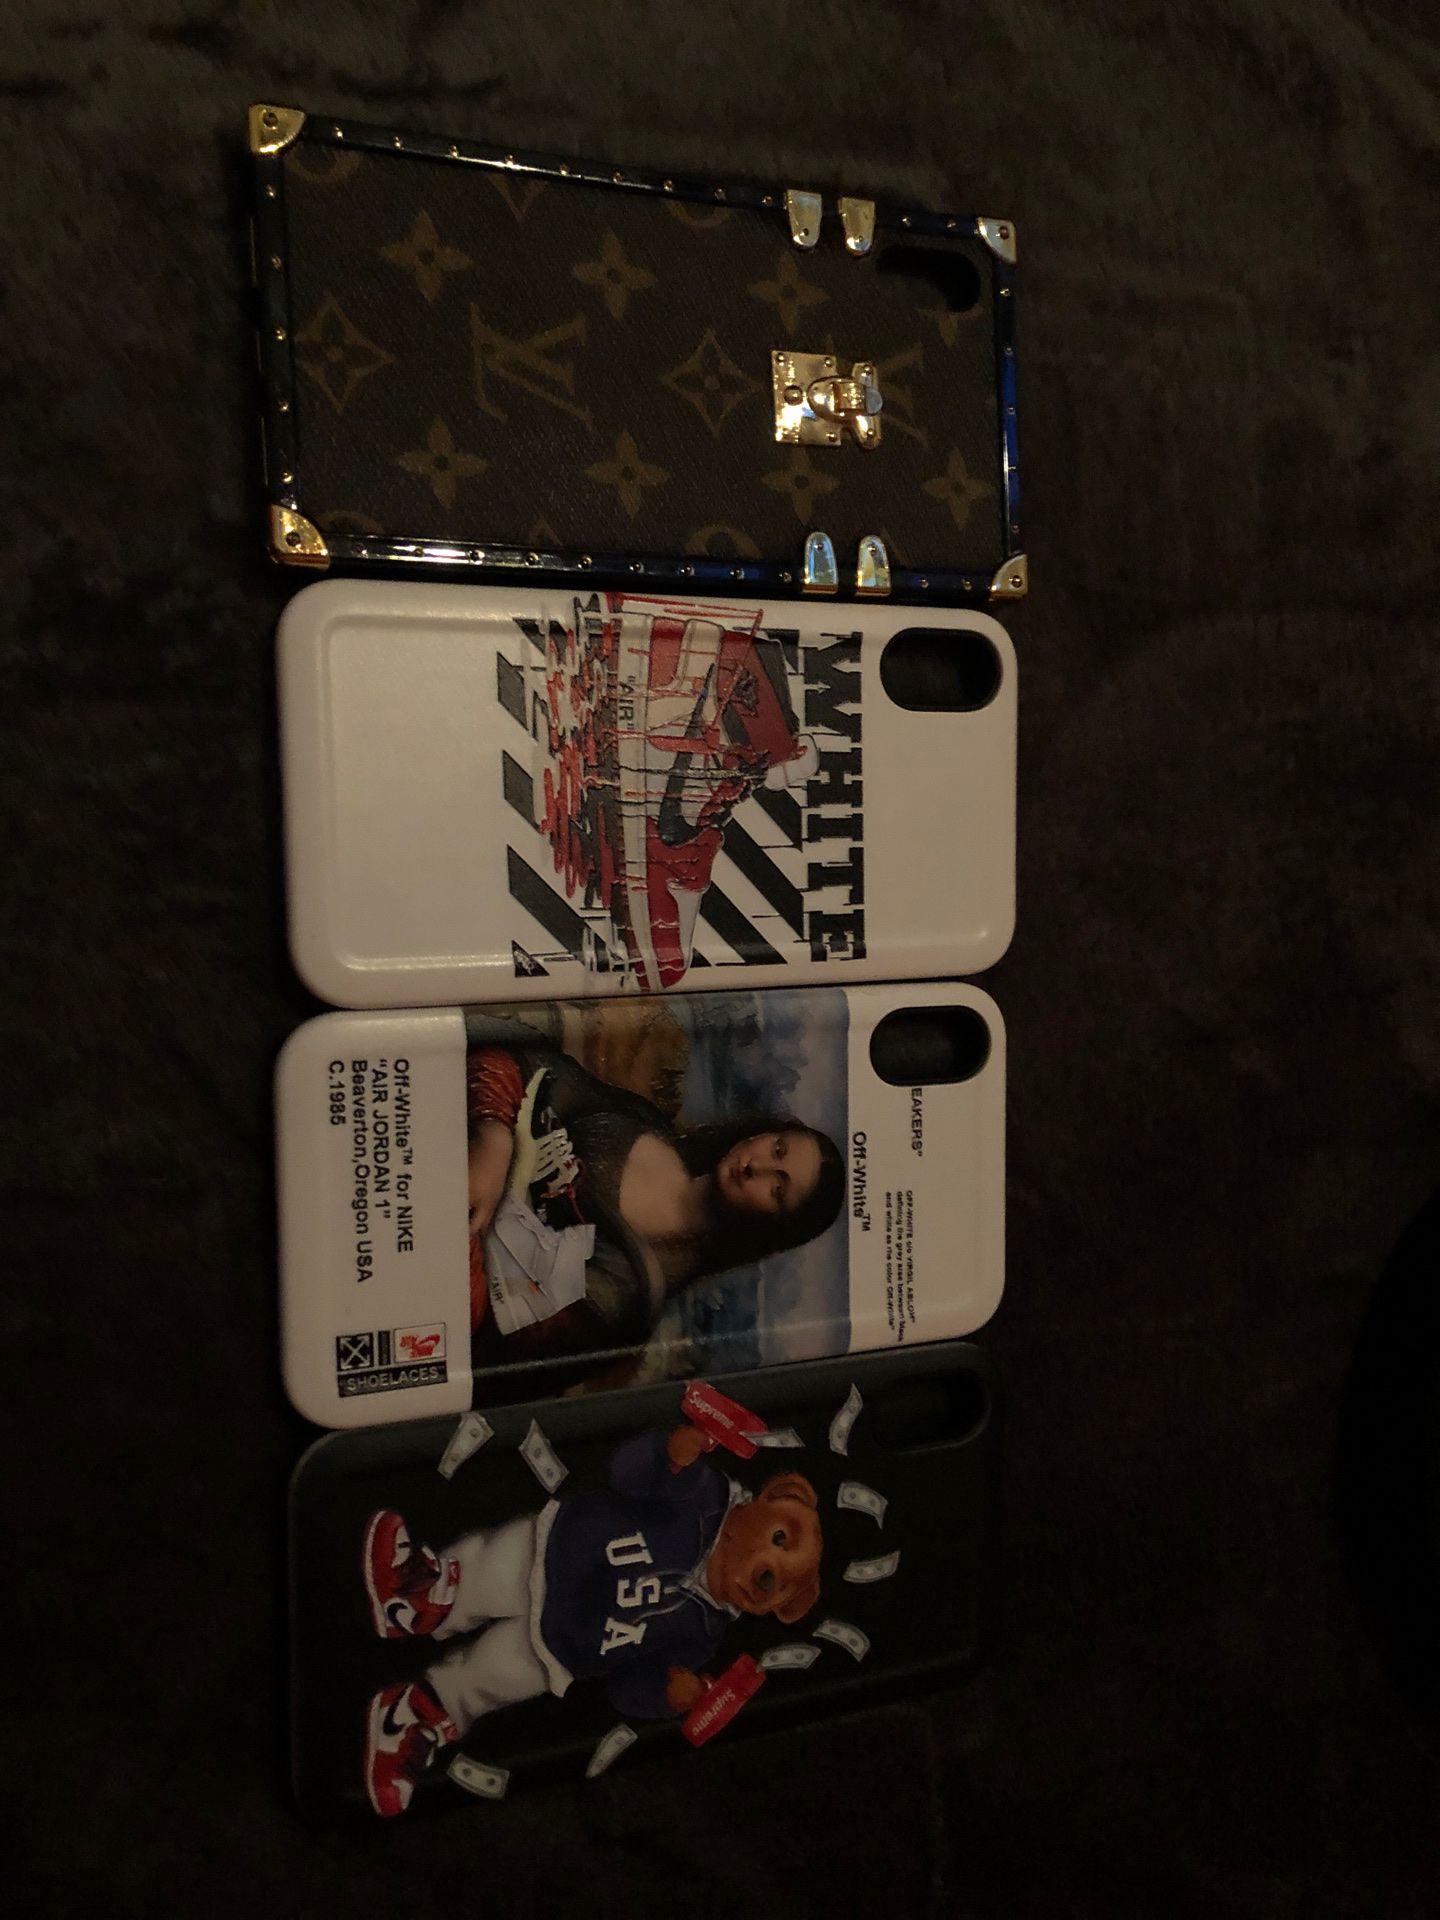 iPhone XS Mac cases 15 each